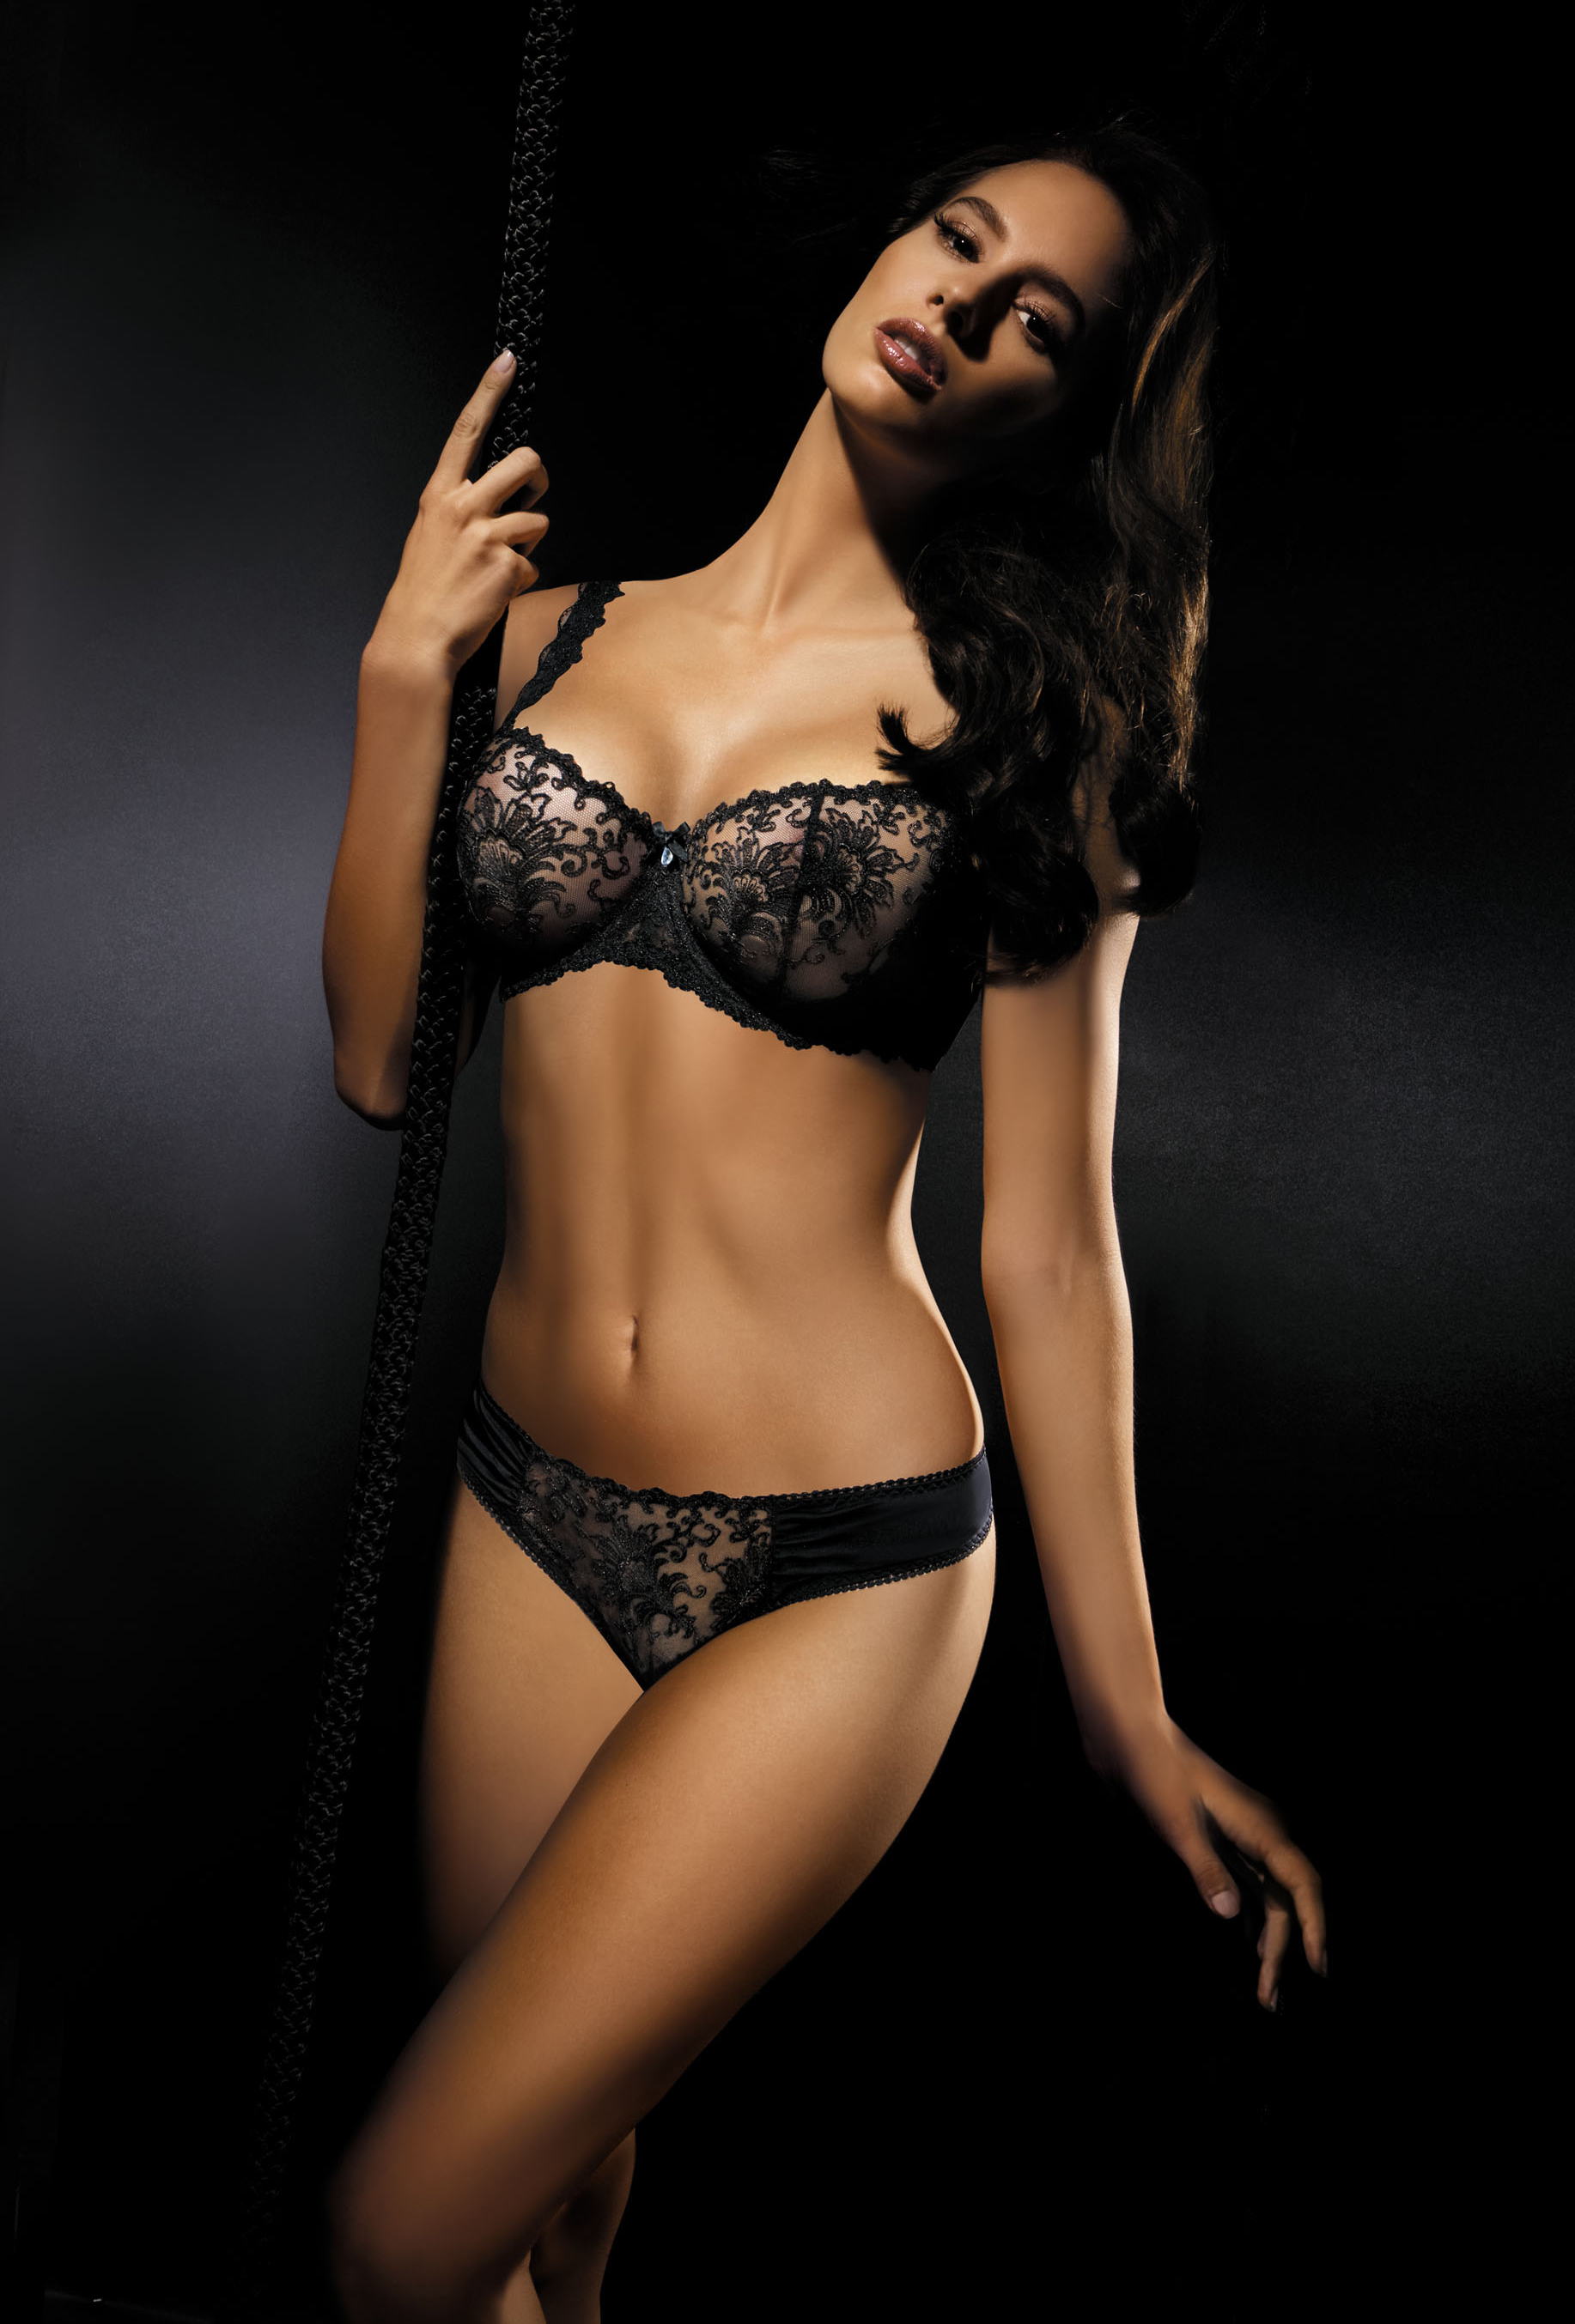 ab40534827e4f6 Biustonosz Le Vernis Romance S - VerBrasi.pl sklep internetowy z ...